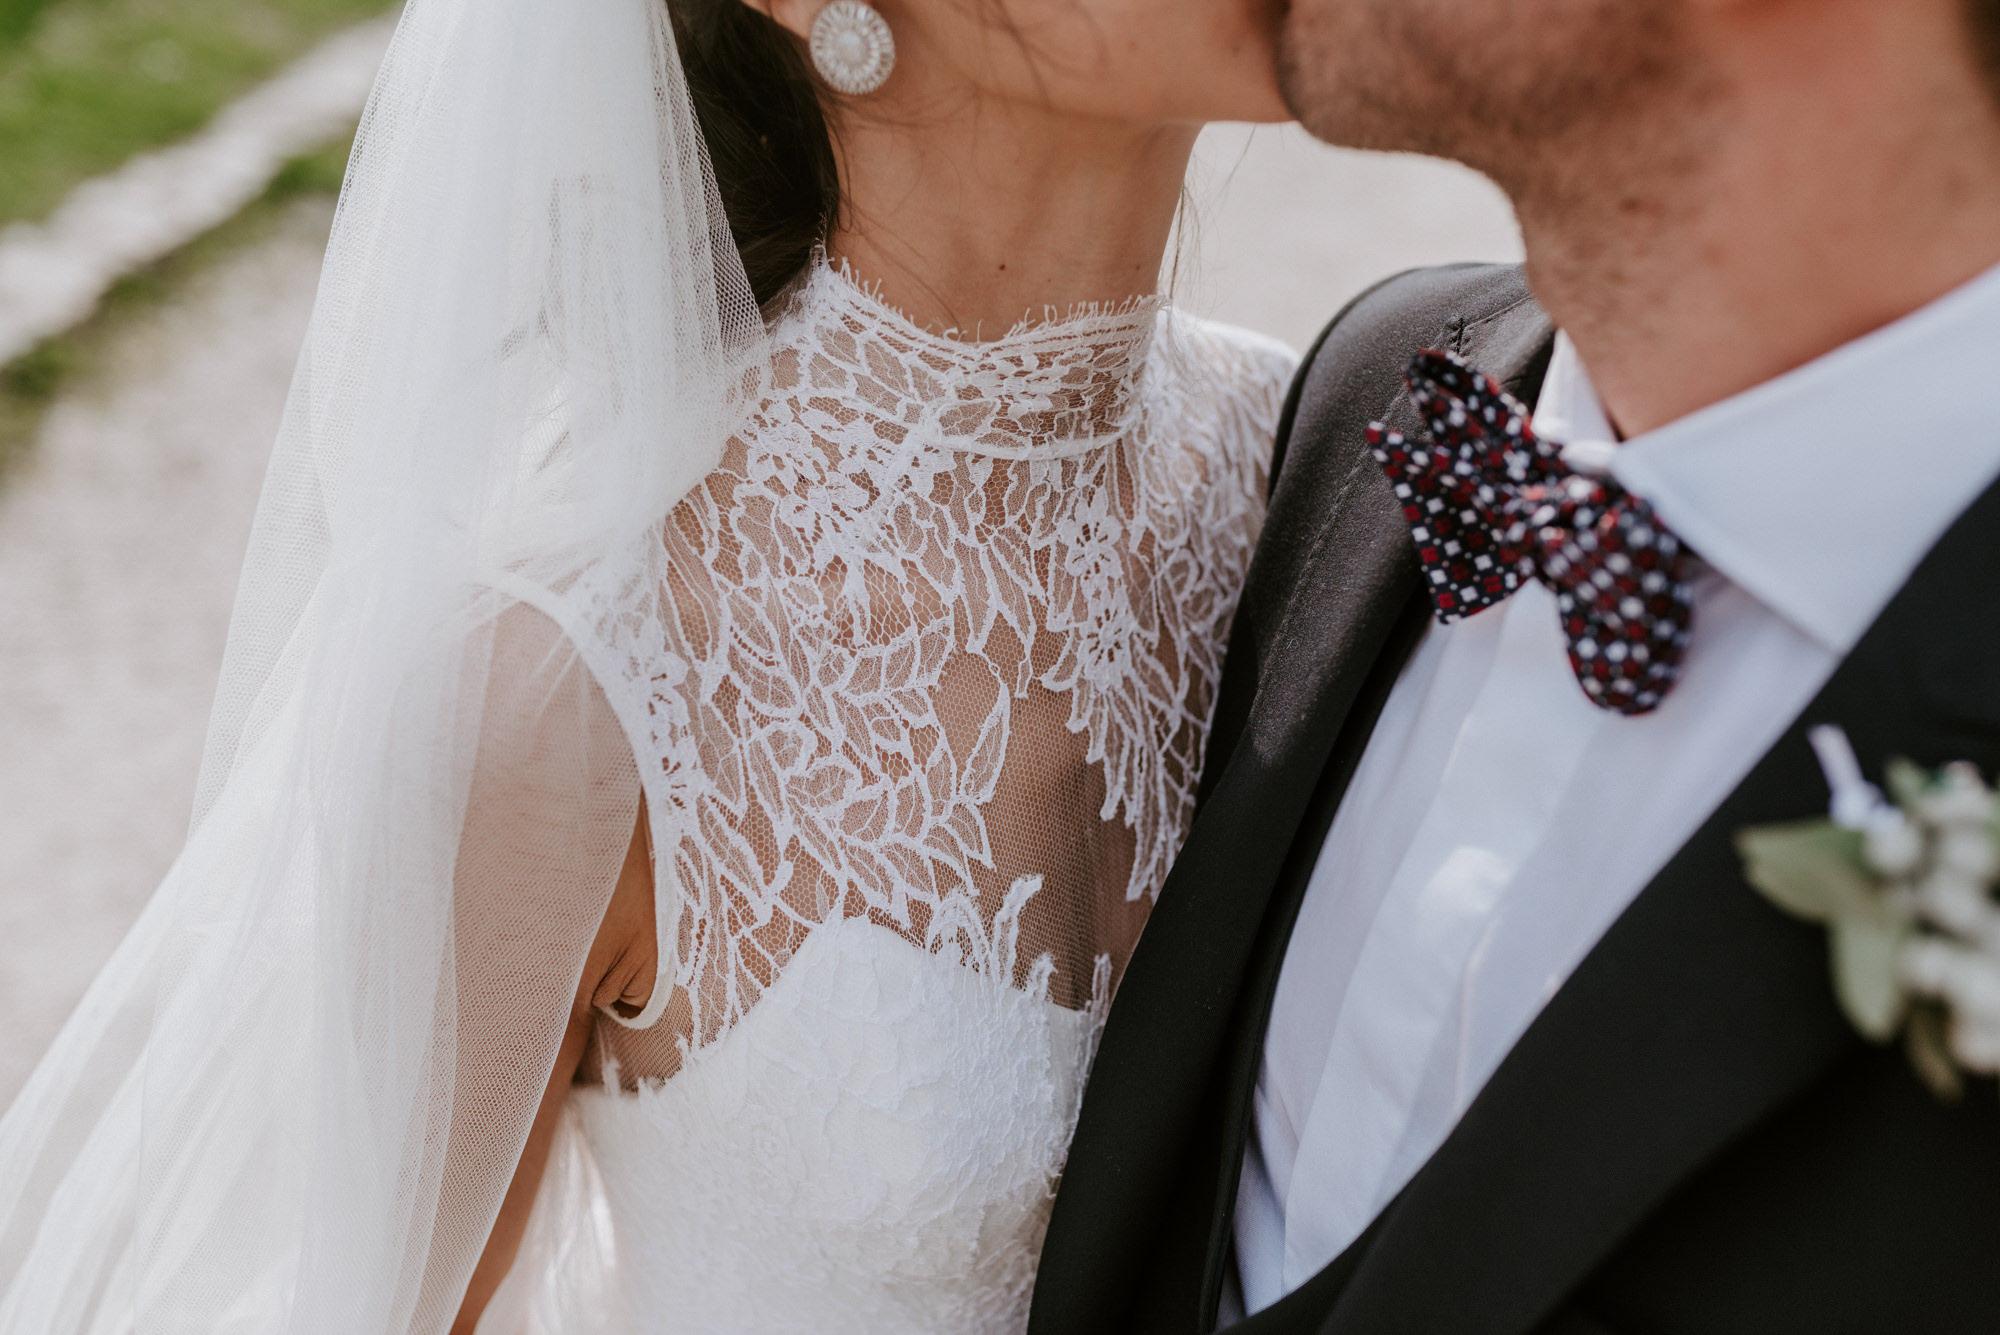 FOTO+PHOTO+BODA+WEDDING+ITALIA+ITALY+MAURICIO+GARAY+MAURICIOGARAY+WEDDINPHOTOGRAPHER+FOTOGRAFODEBODA-1275.jpg